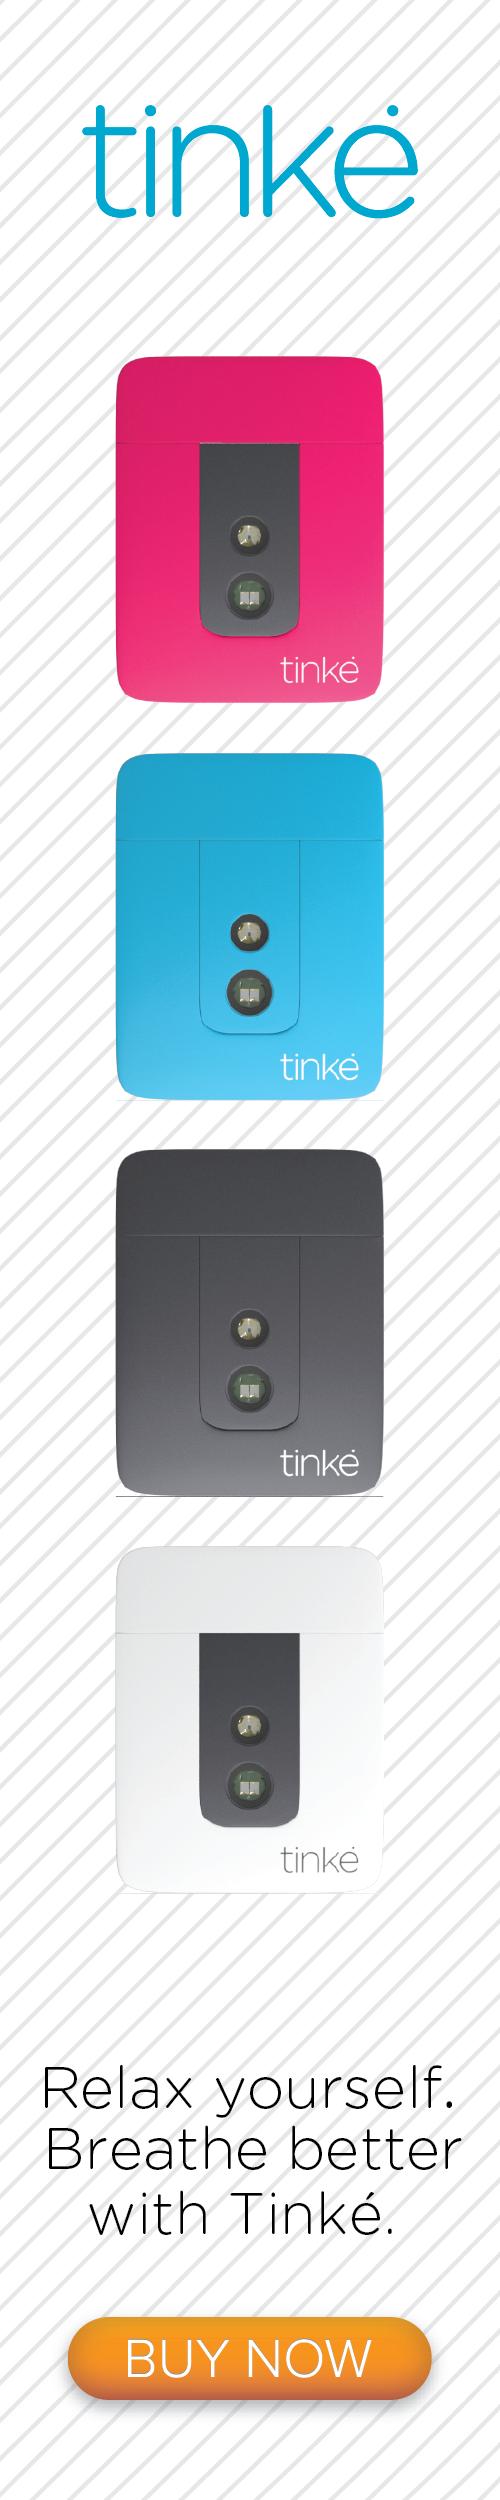 zensorium-tinke-large